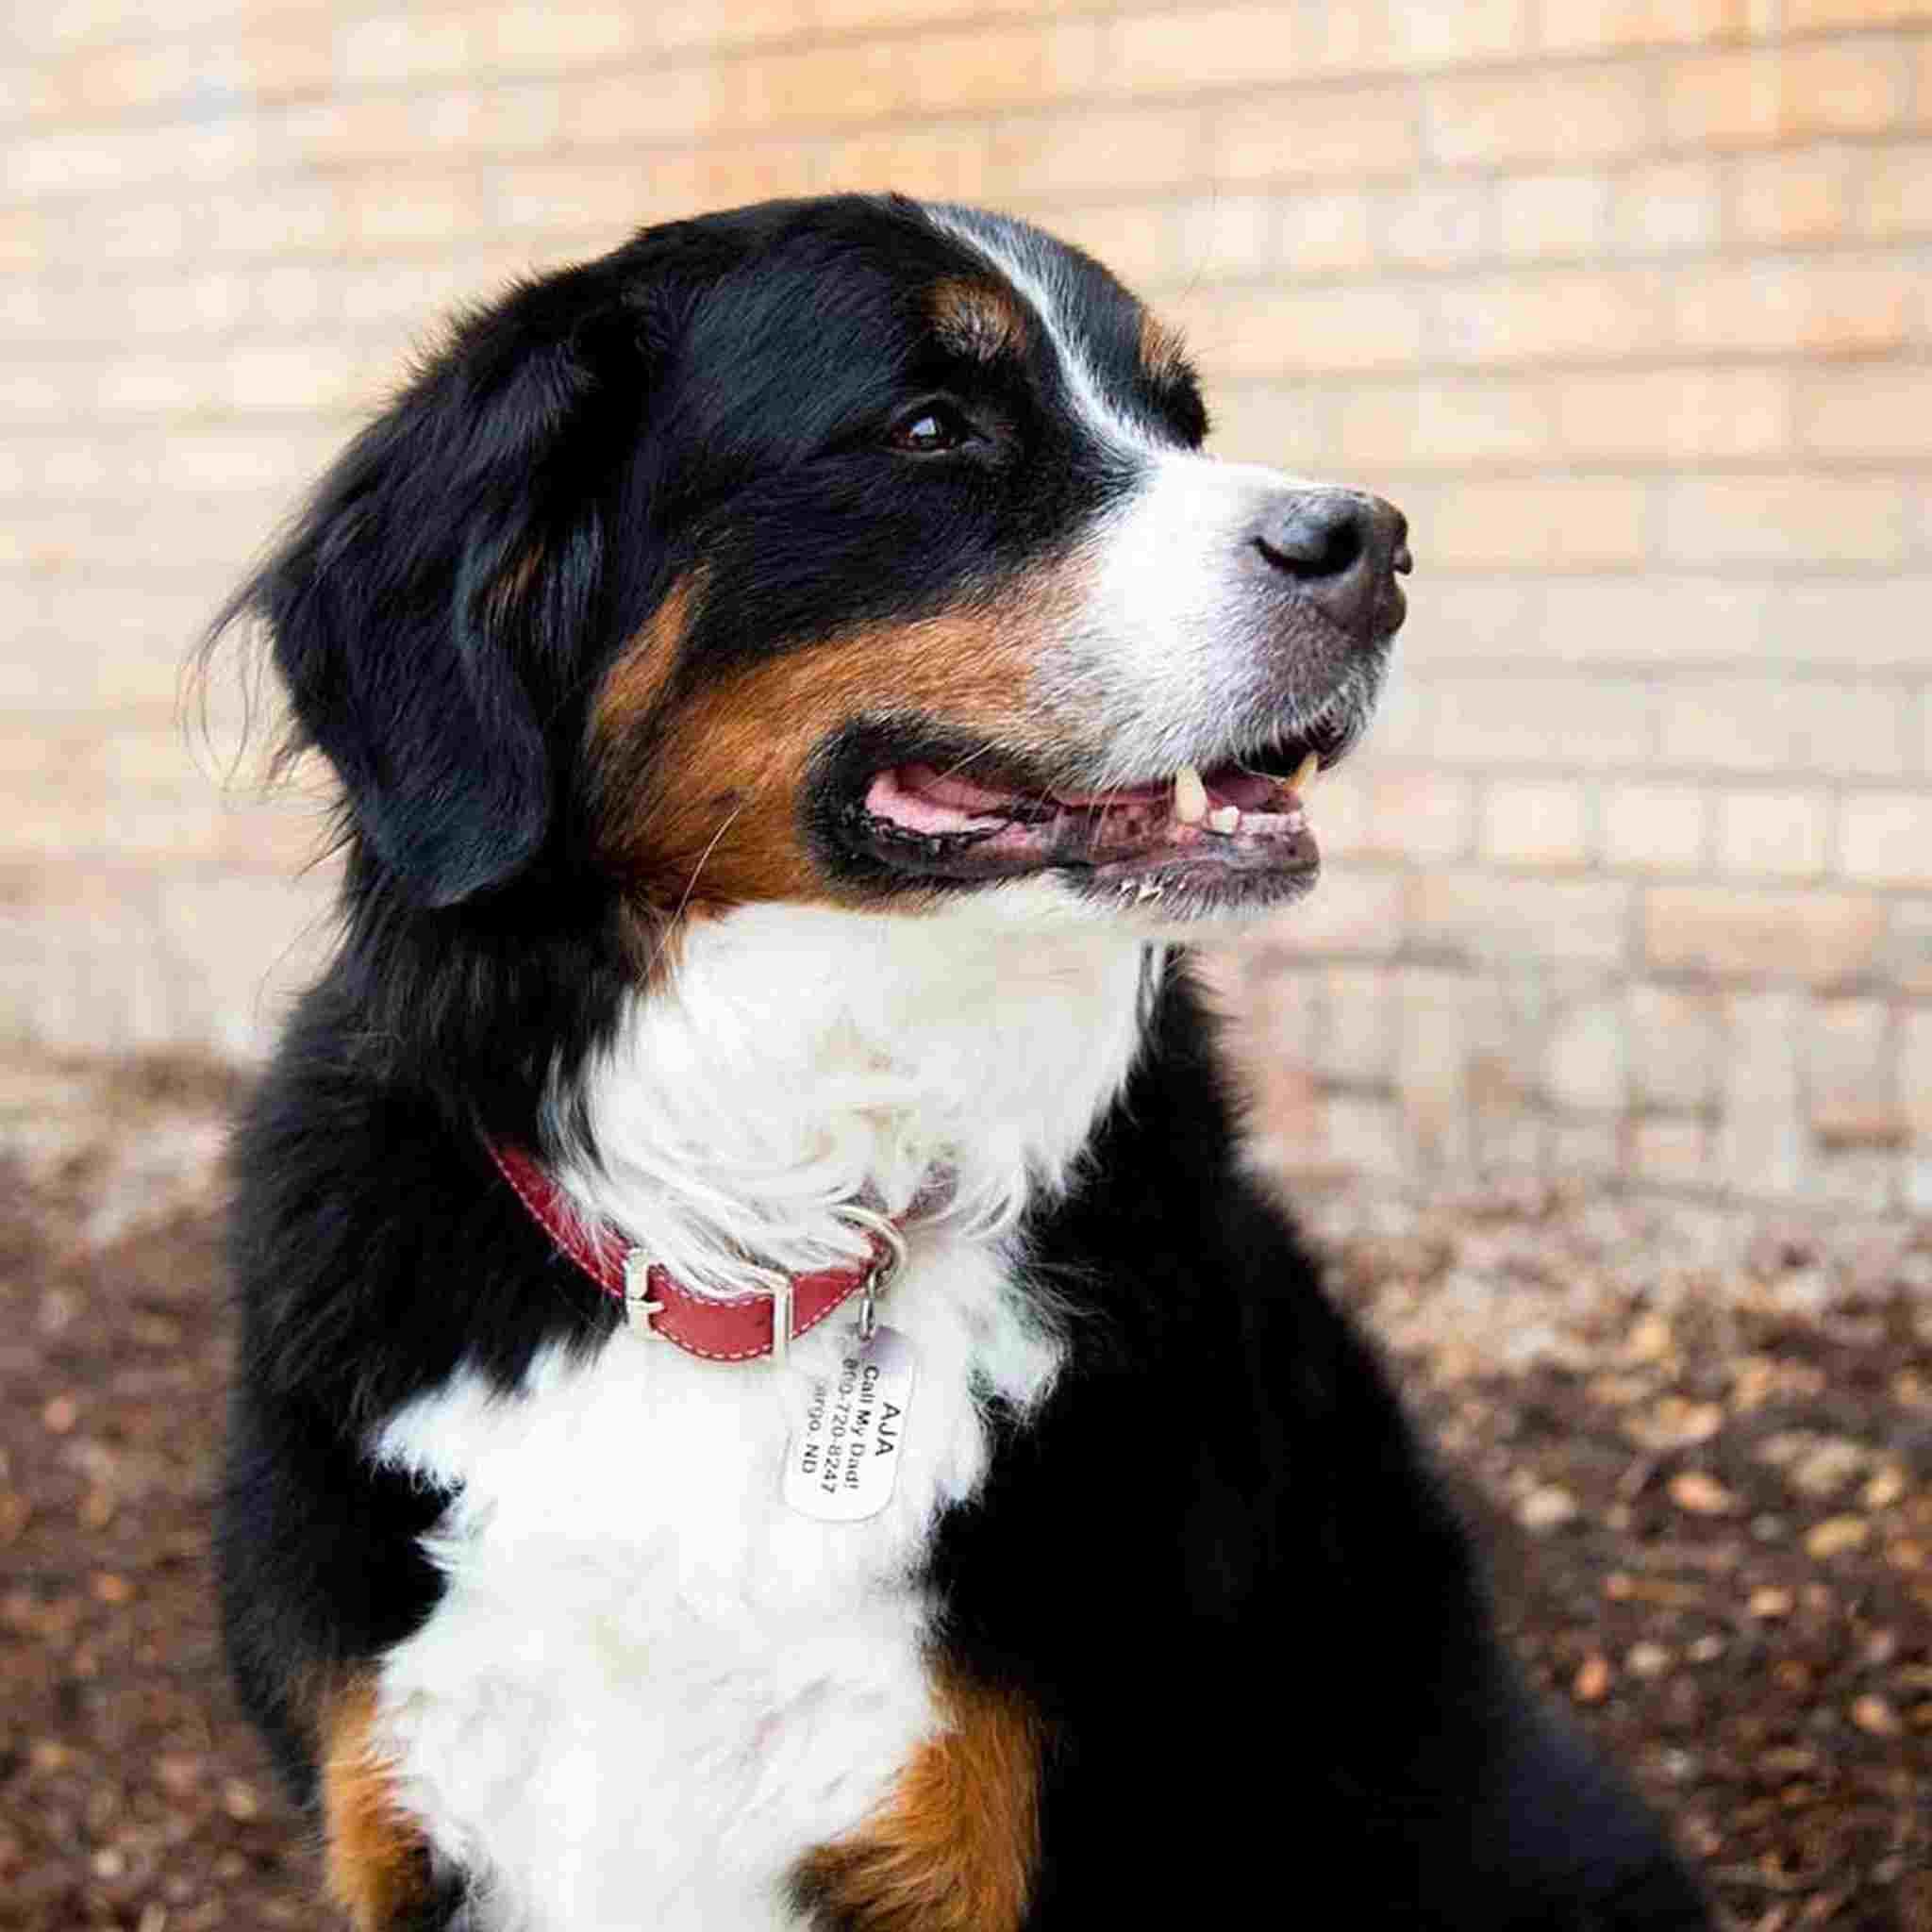 Military Dog ID Tags - On Dog